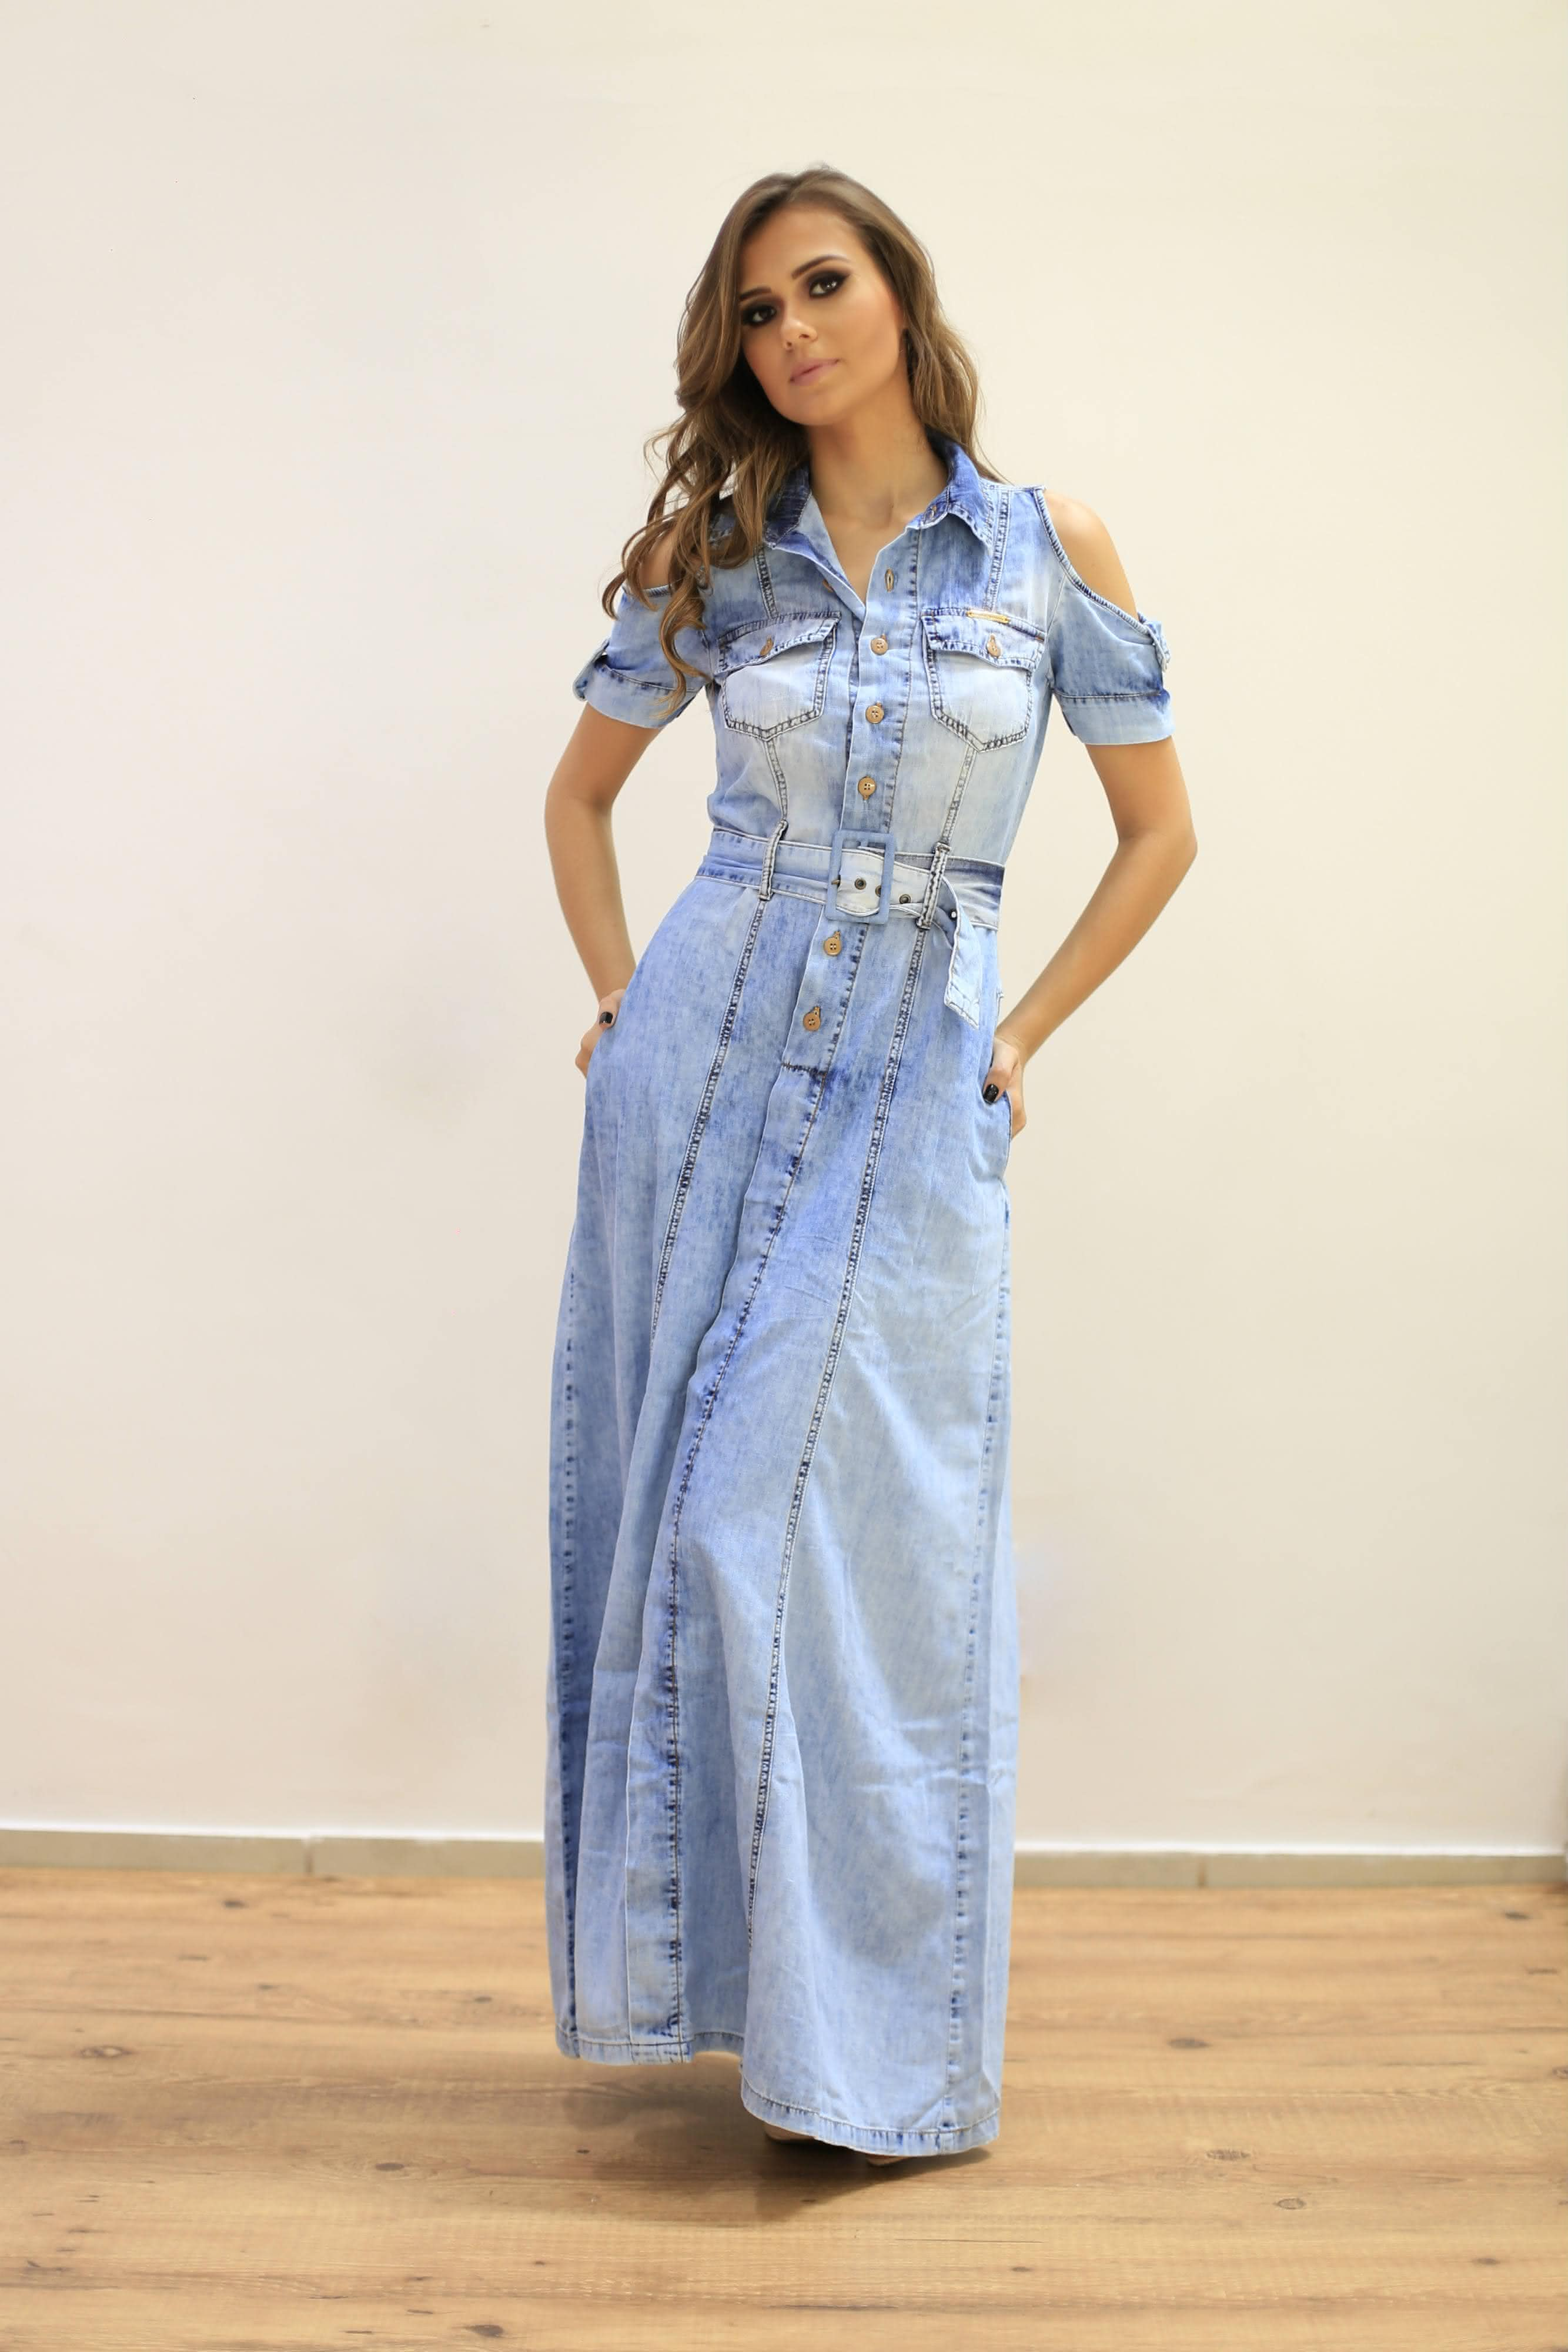 Vestido jeans longo de manga